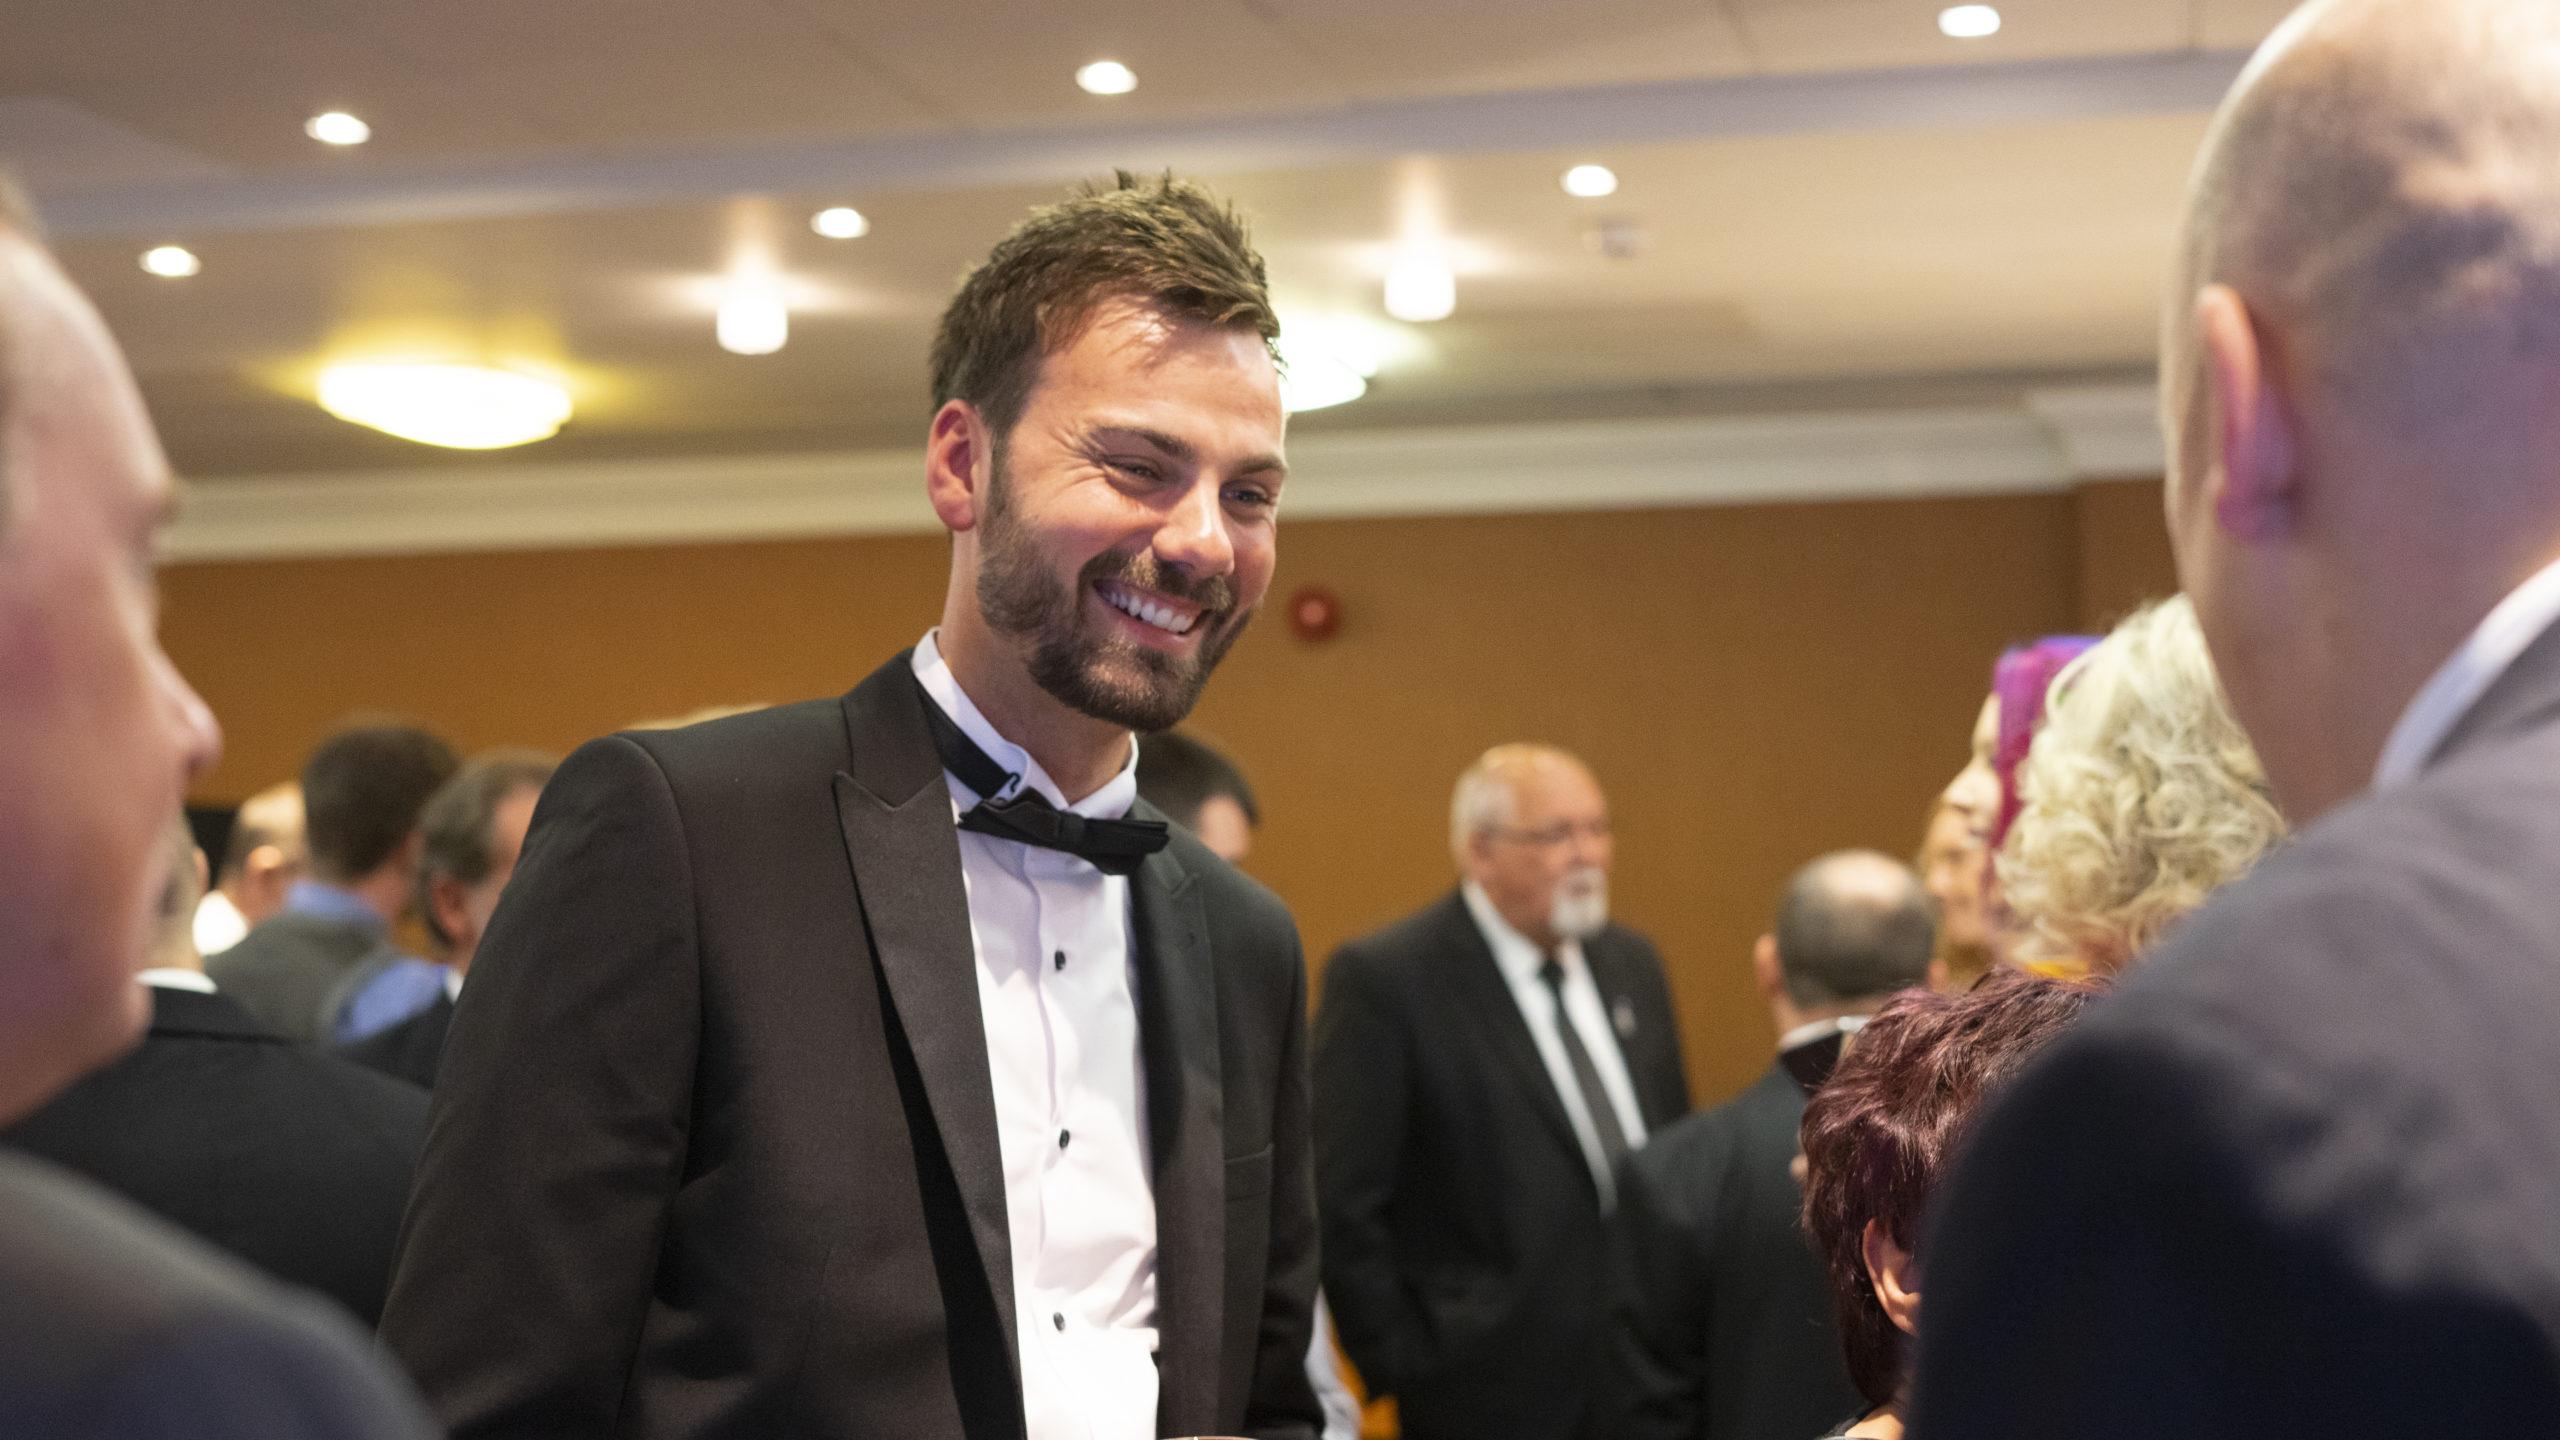 Reuse Network Conference 2019 smartly dressed for awards